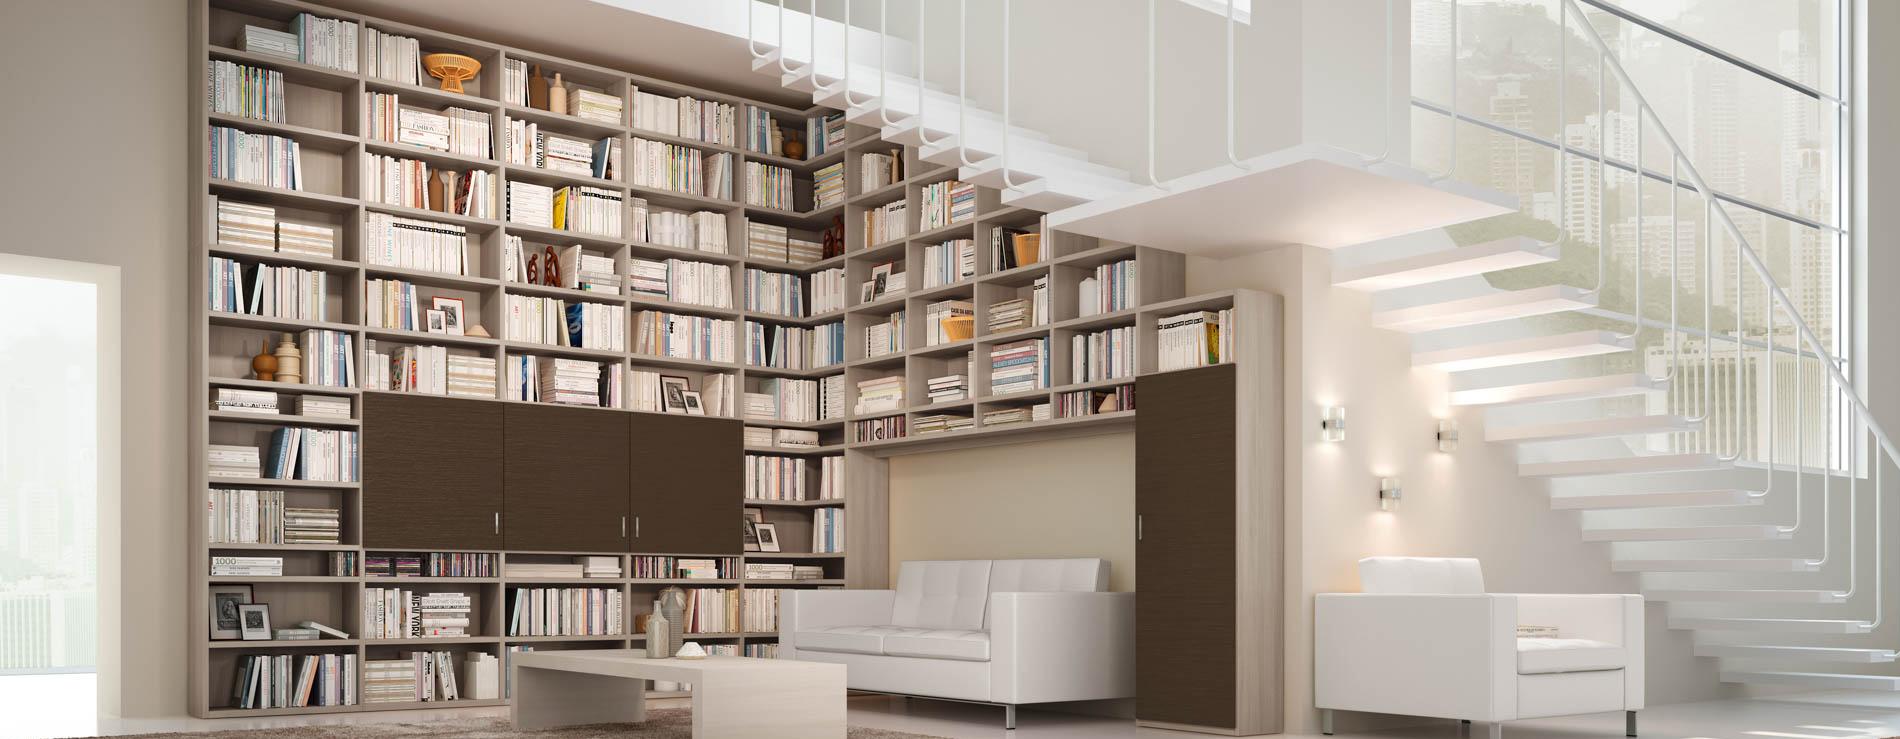 Libreria 71 ferri mobili centro mobili godiasco pavia - Centro italiano mobili ...